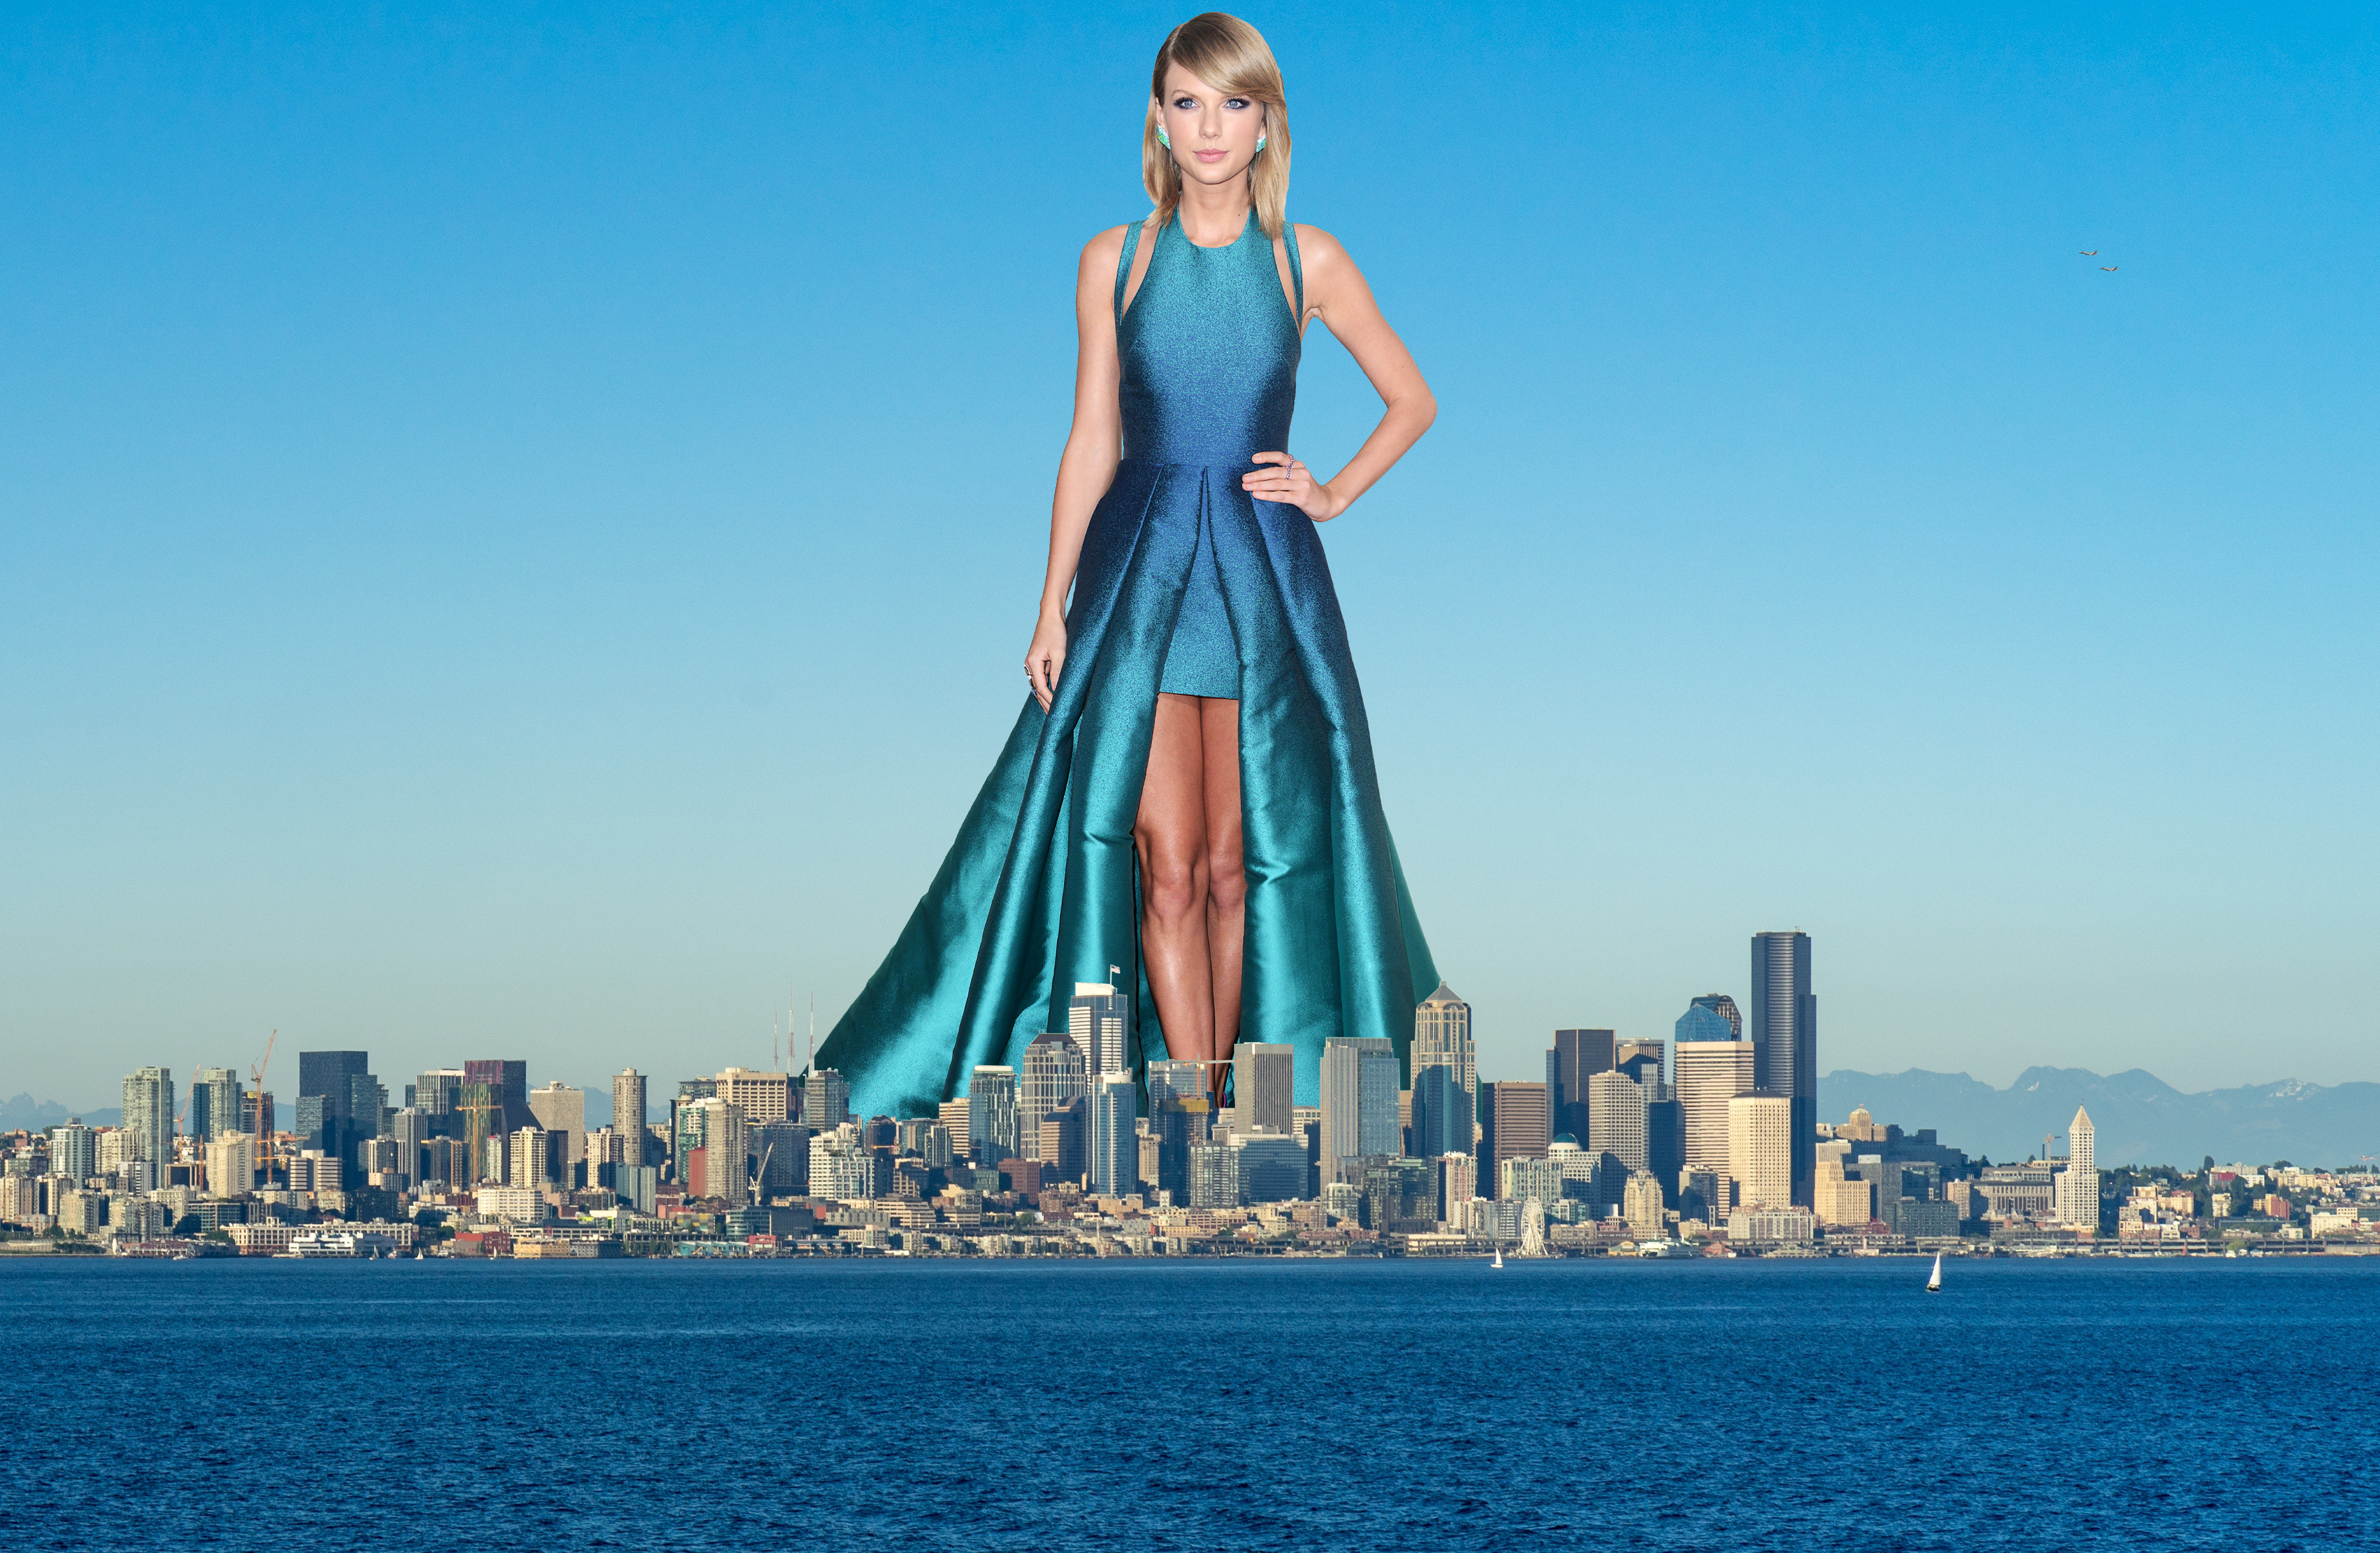 Giantess Taylor Swift In Seattle By 870express On Deviantart